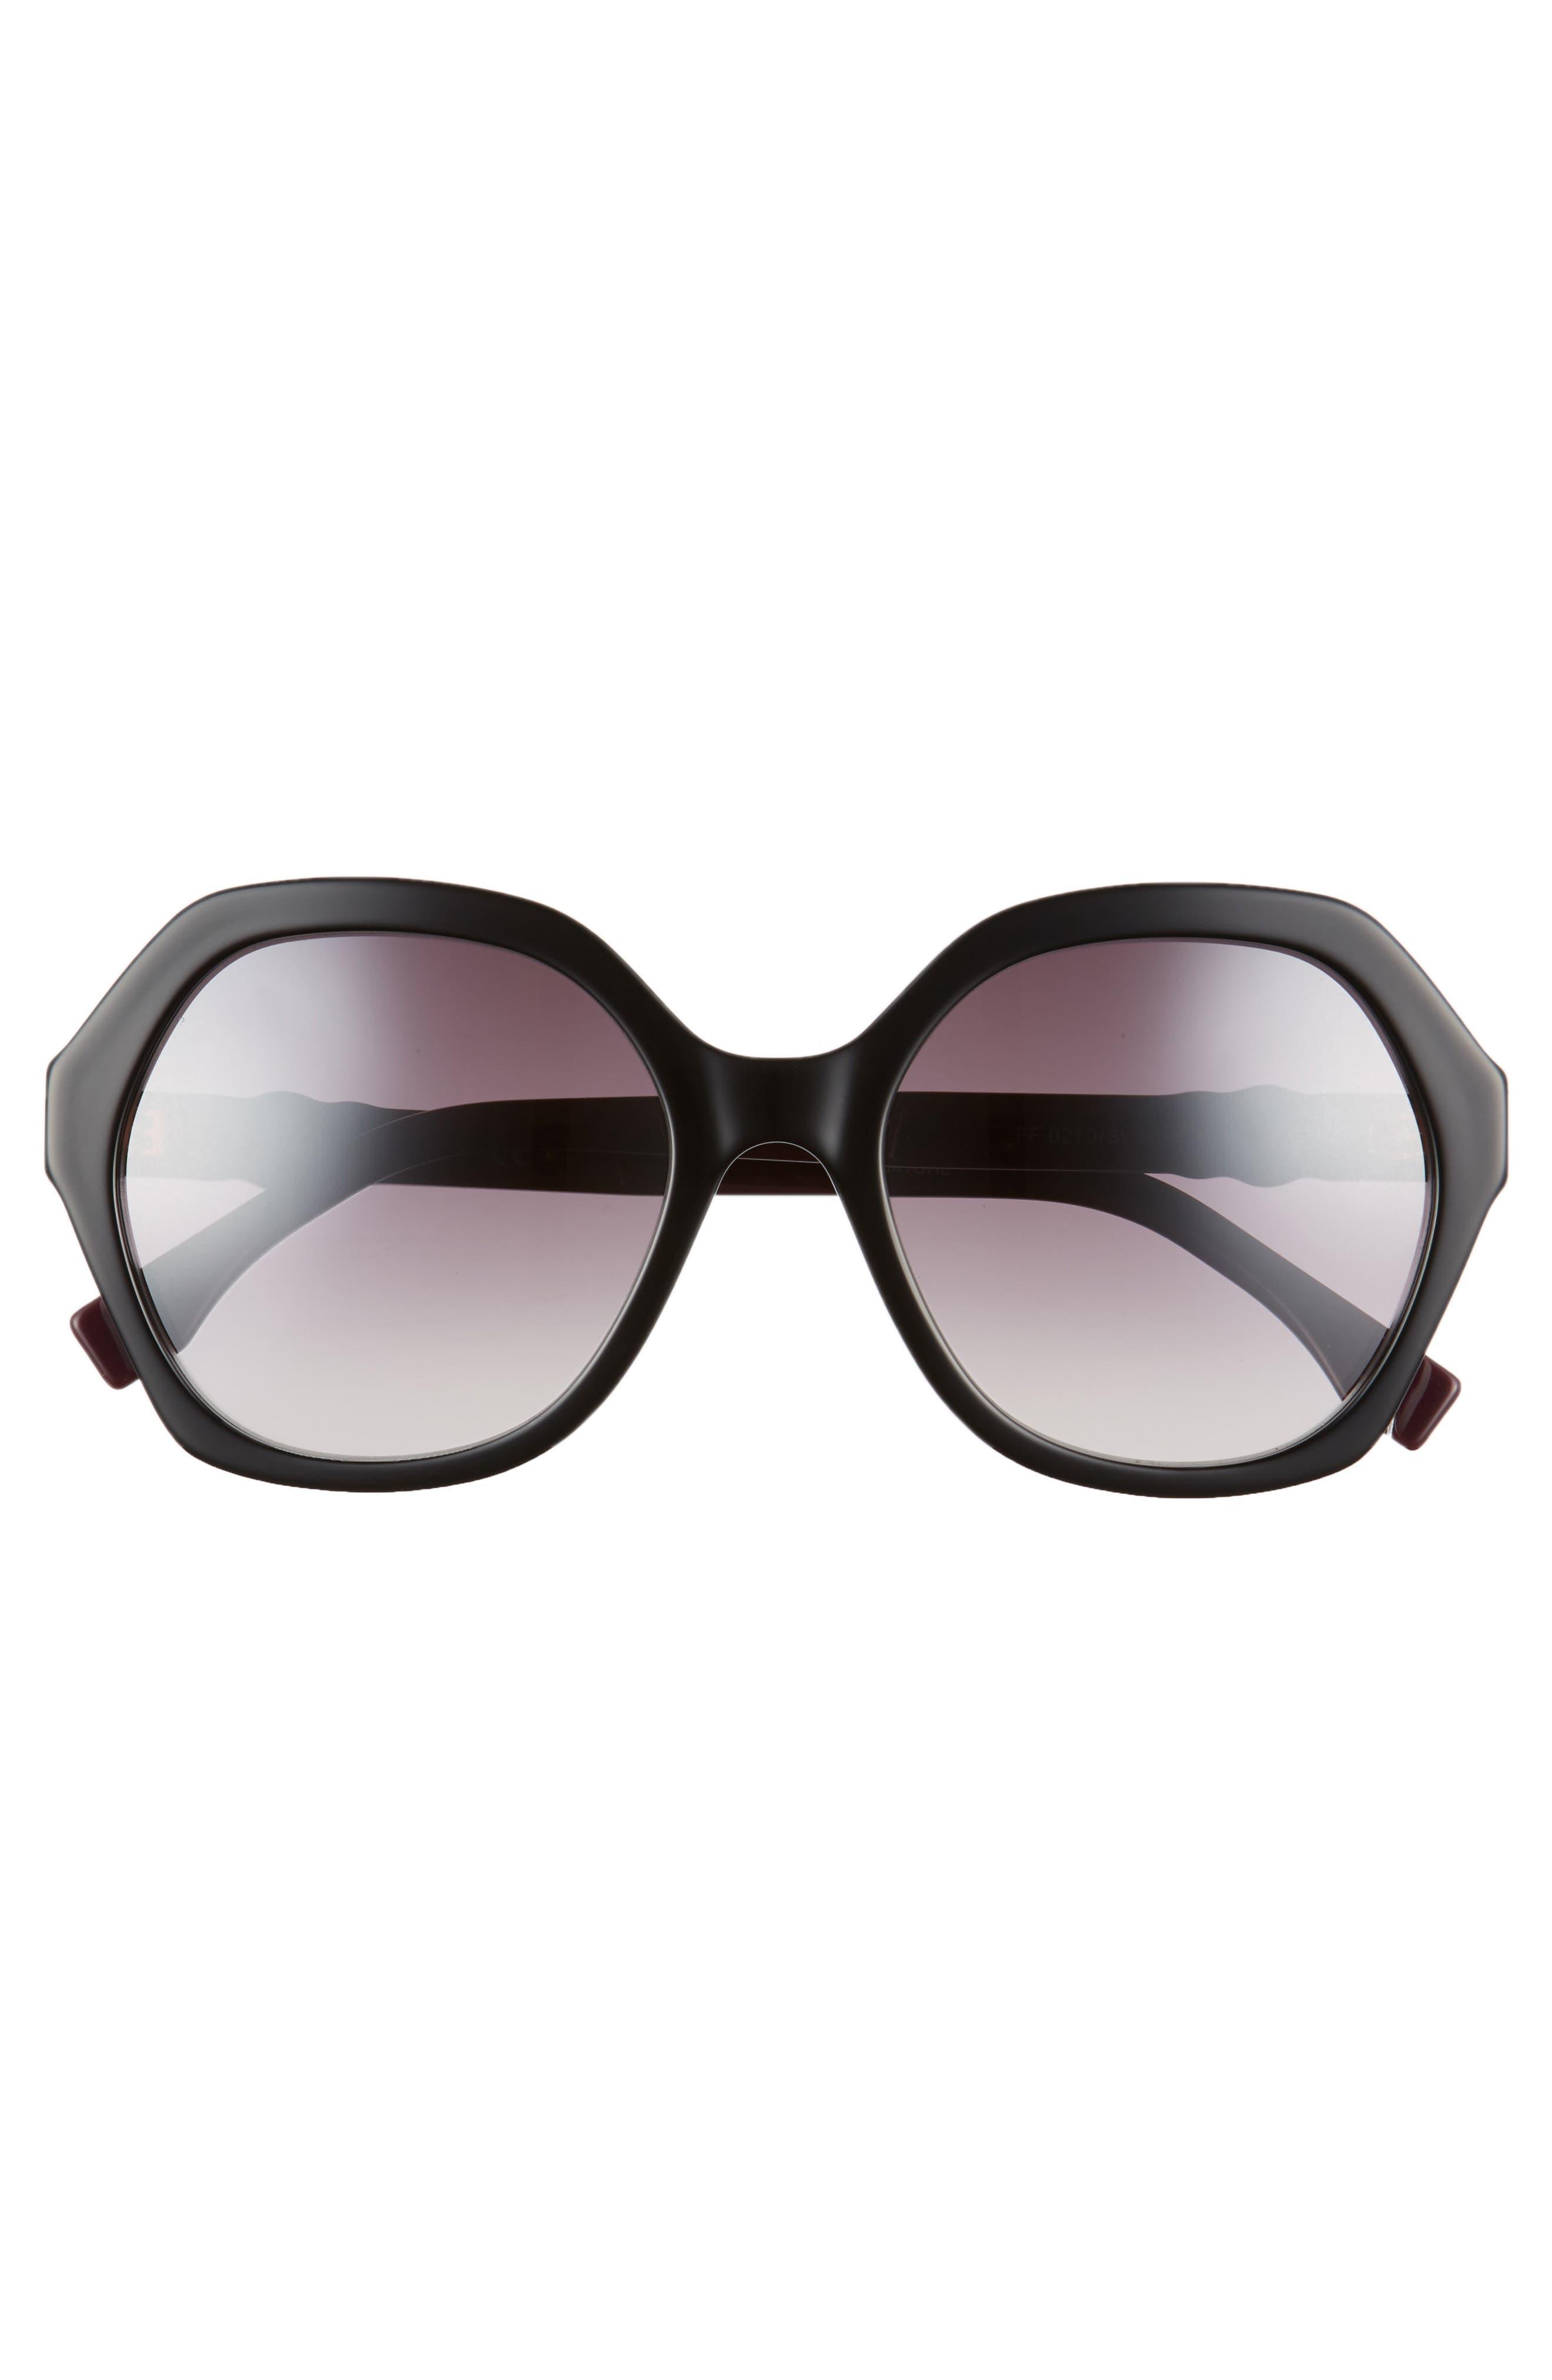 56mm Oversize Sunglasses,                             Alternate thumbnail 3, color,                             001